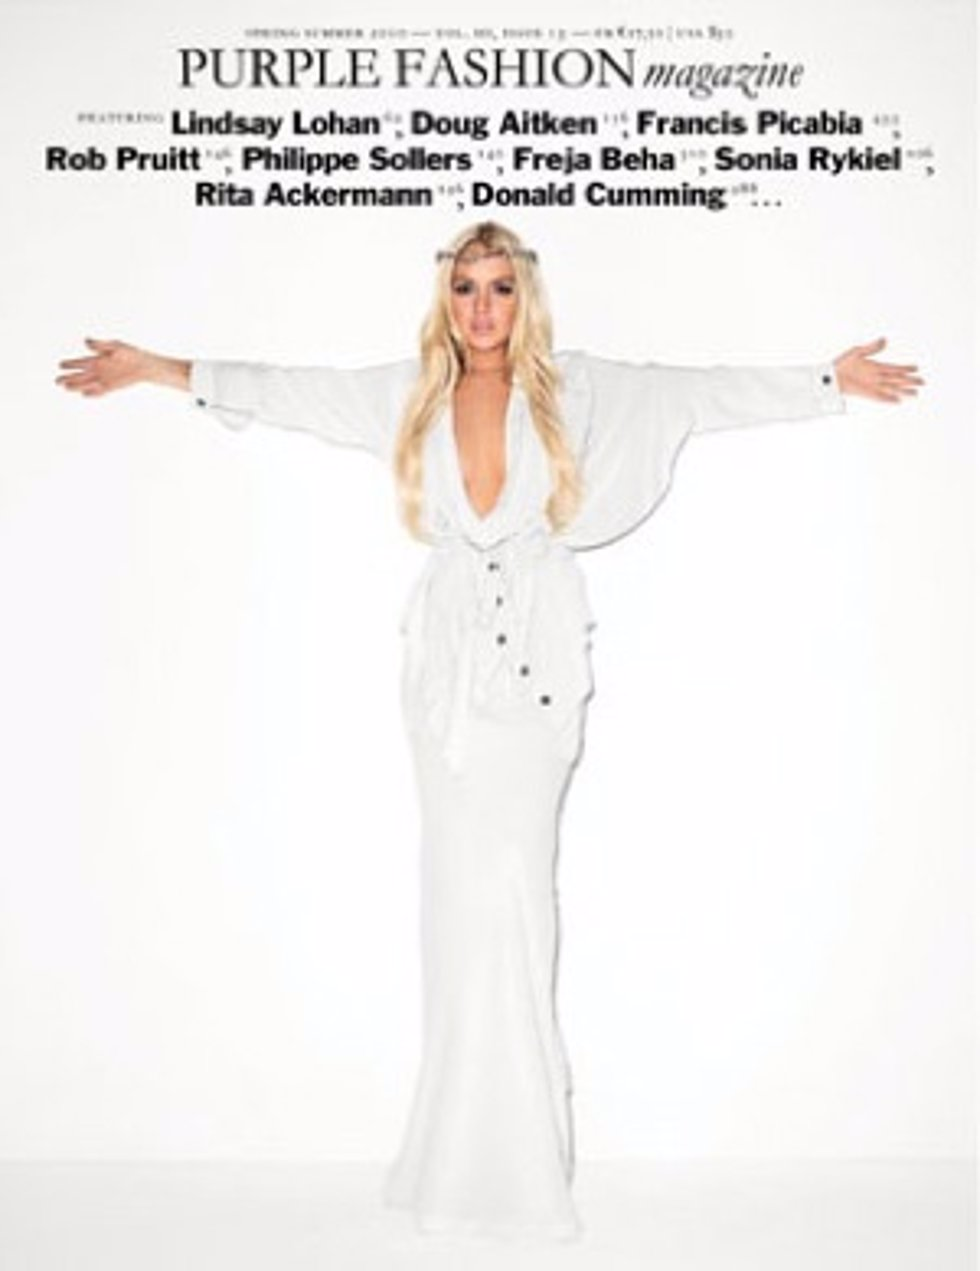 La actriz Lindsay Lohan emulando a Jesucristo en la portada de 'Purple Fashion'